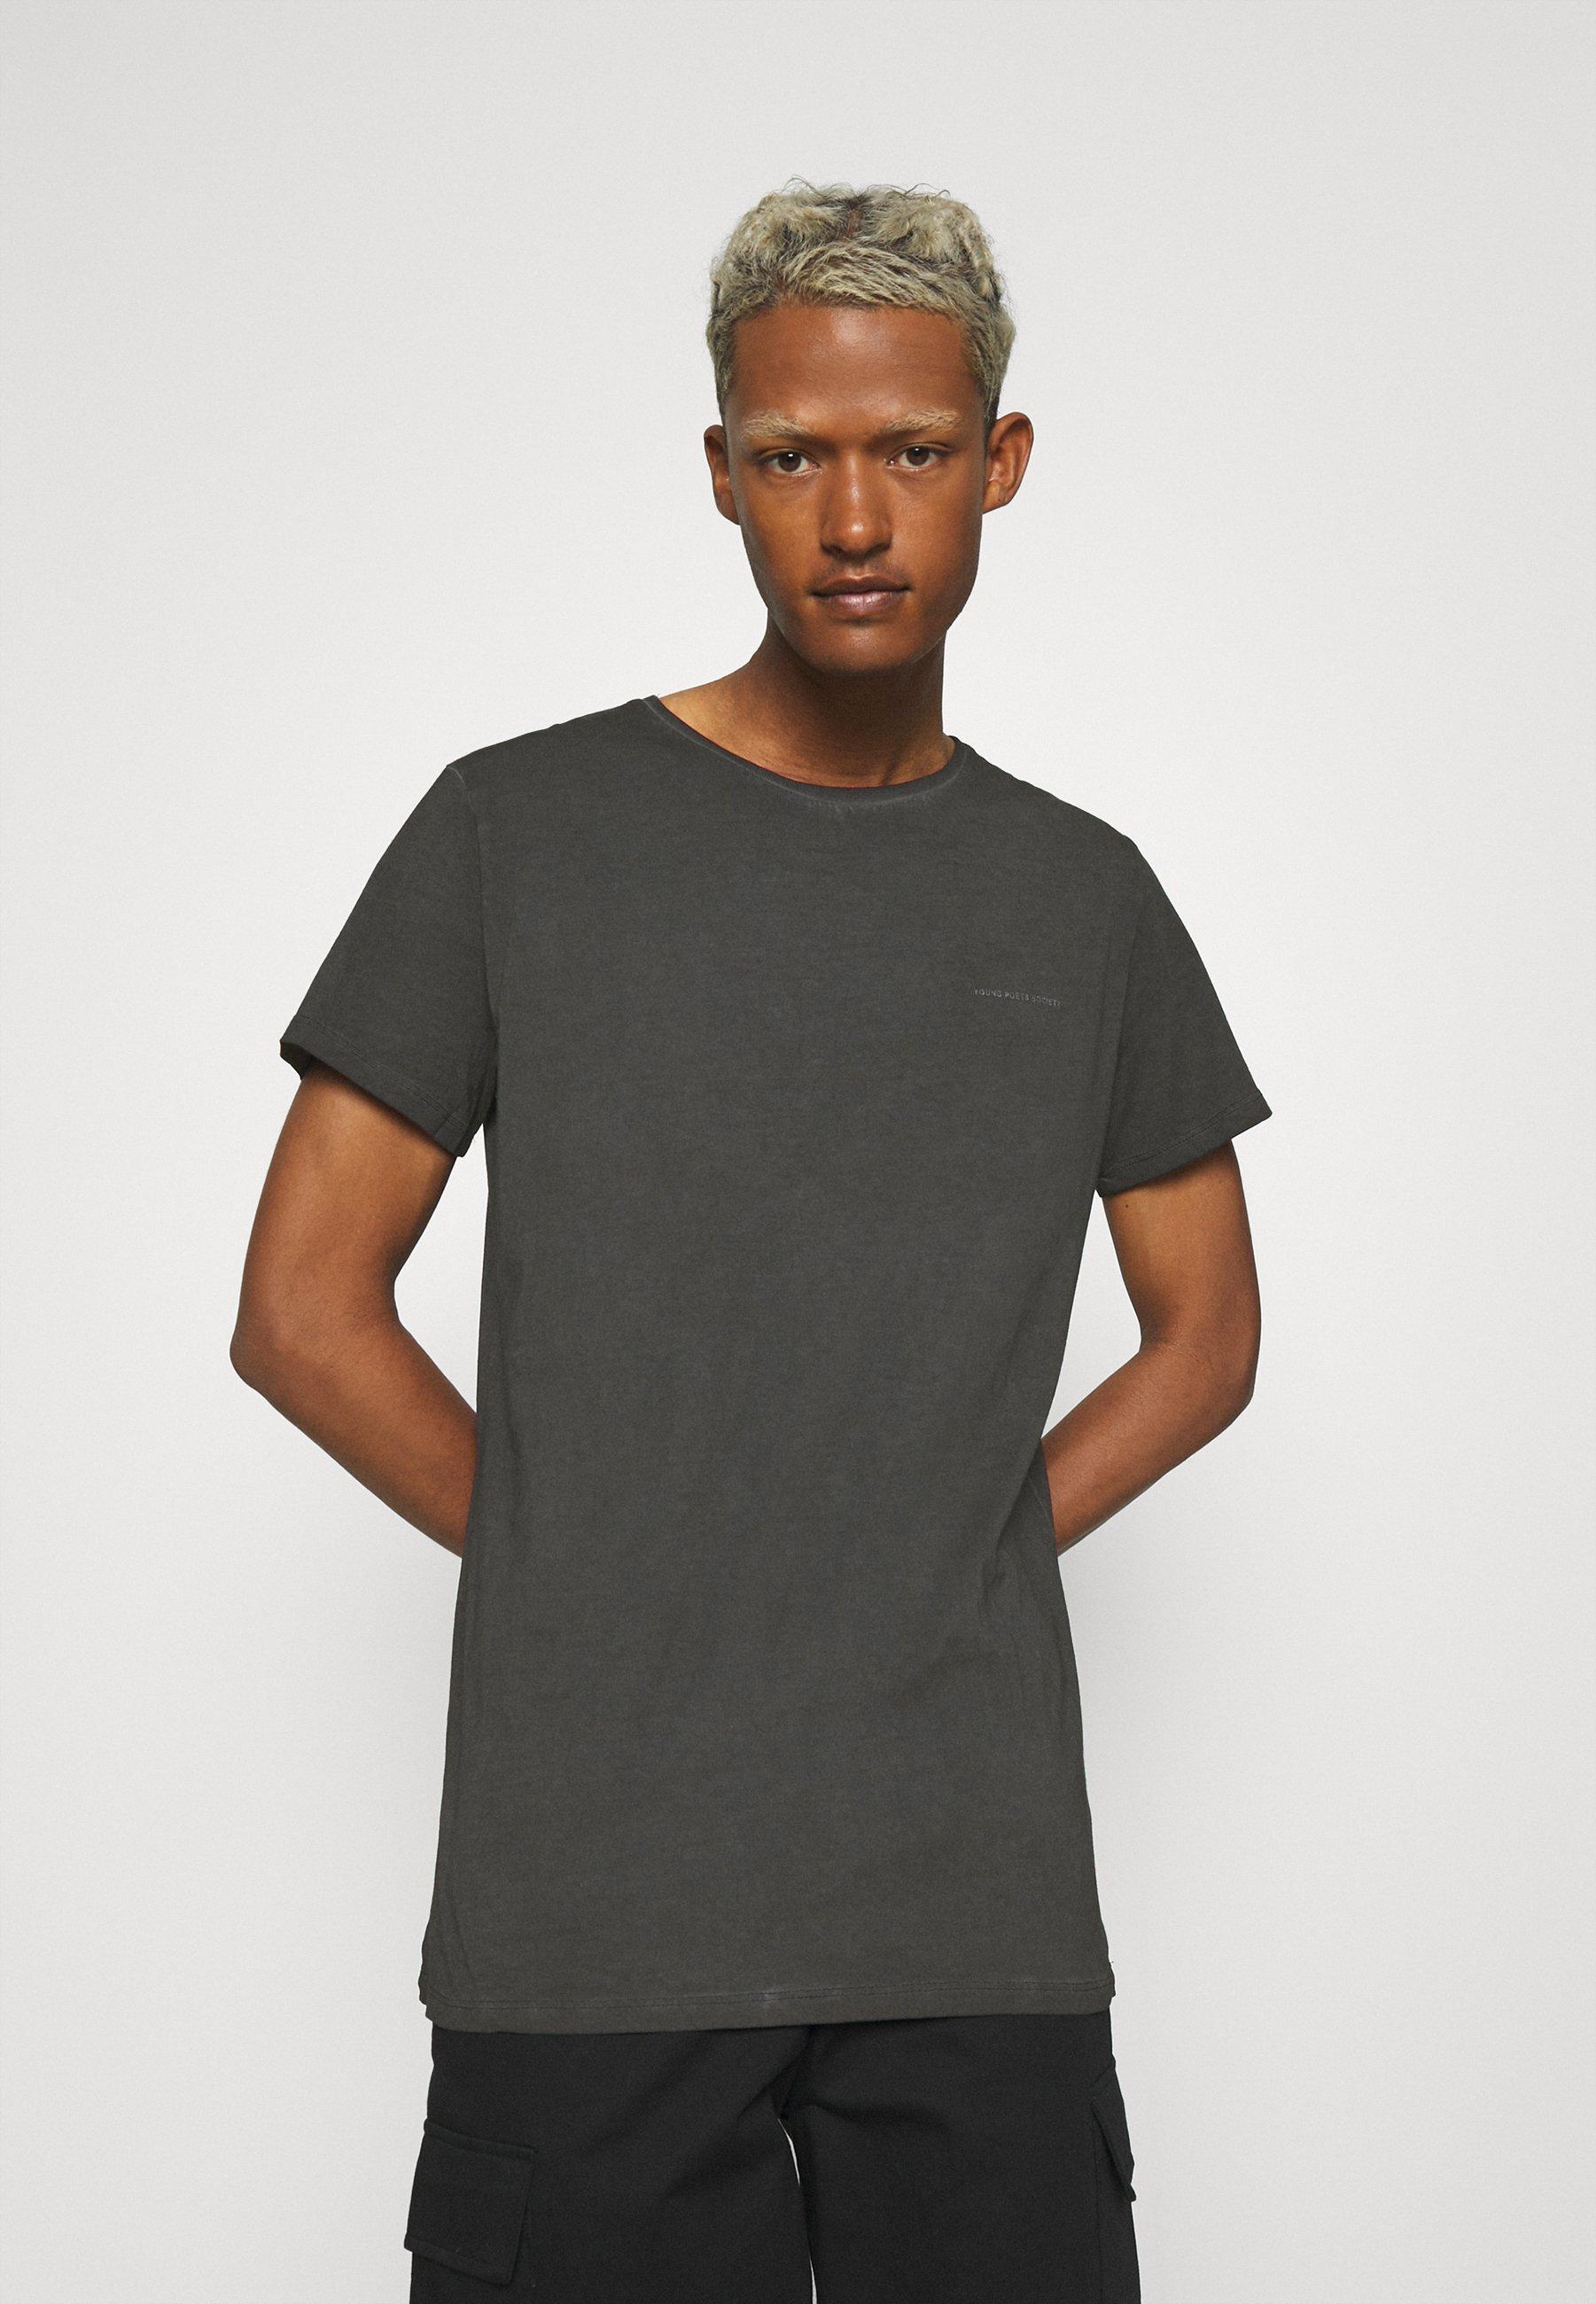 Homme HEIN VINTAGE - T-shirt basique